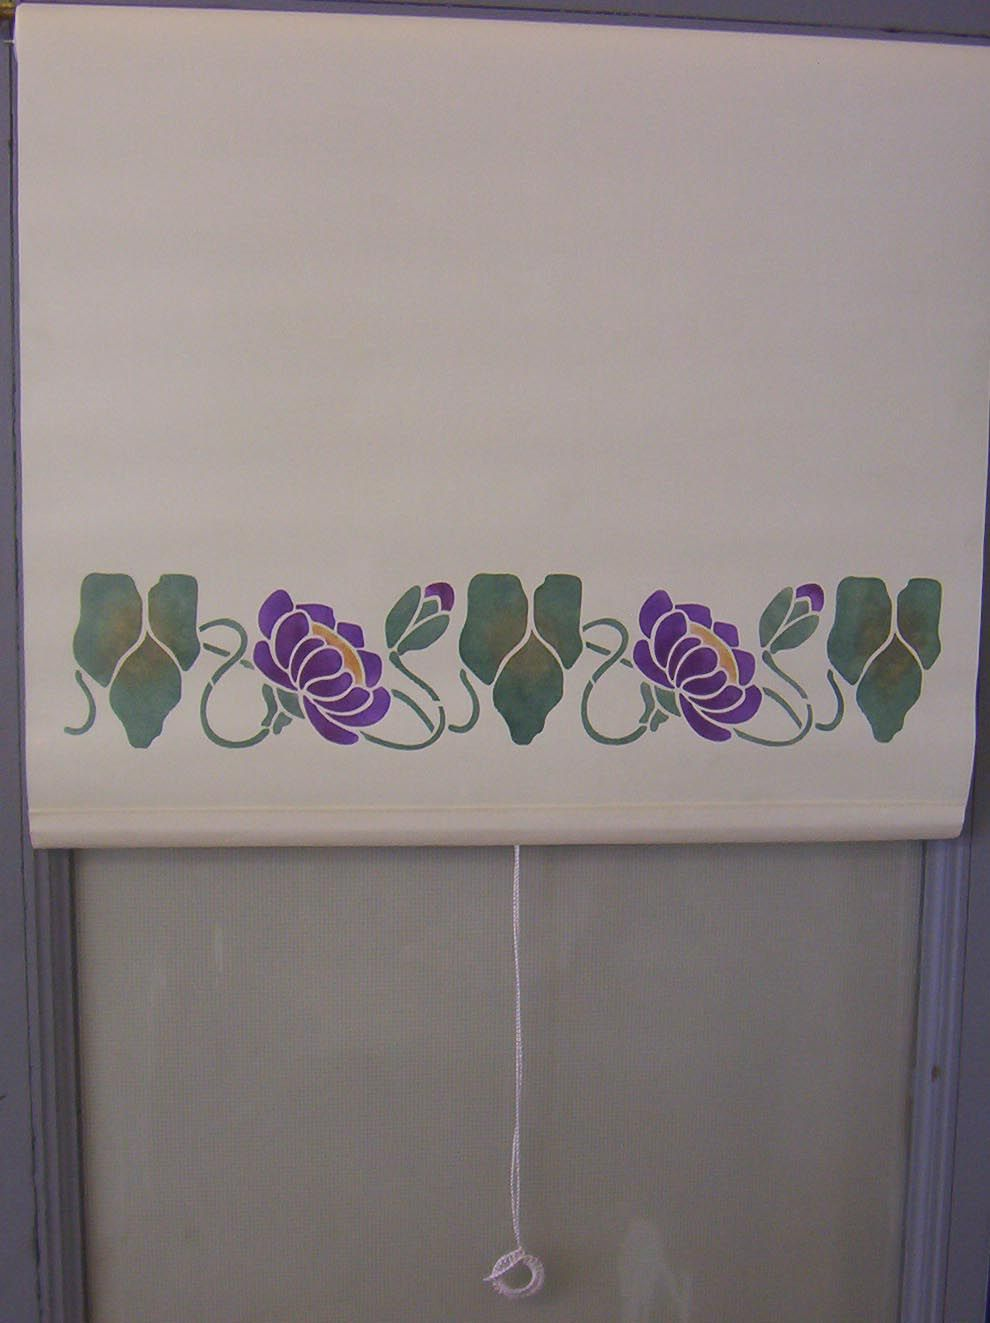 Arts Crafts Stencils Stencil Crafts Wallpaper Stencil Arts And Crafts